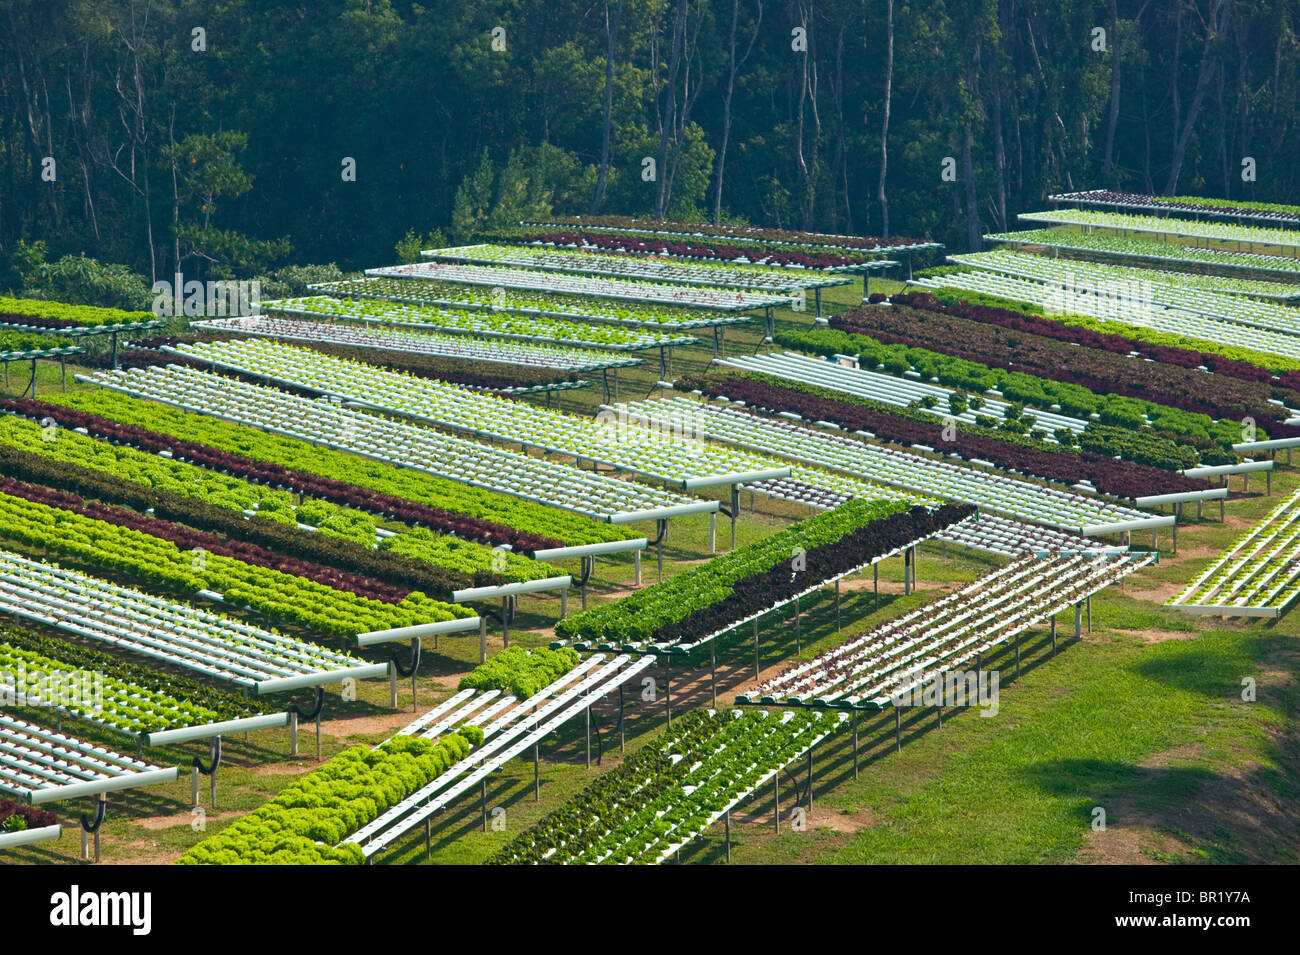 Australia, Queensland, Sunshine Coast, Pomona. Campos de terrazas de macrobiótica granja. Imagen De Stock